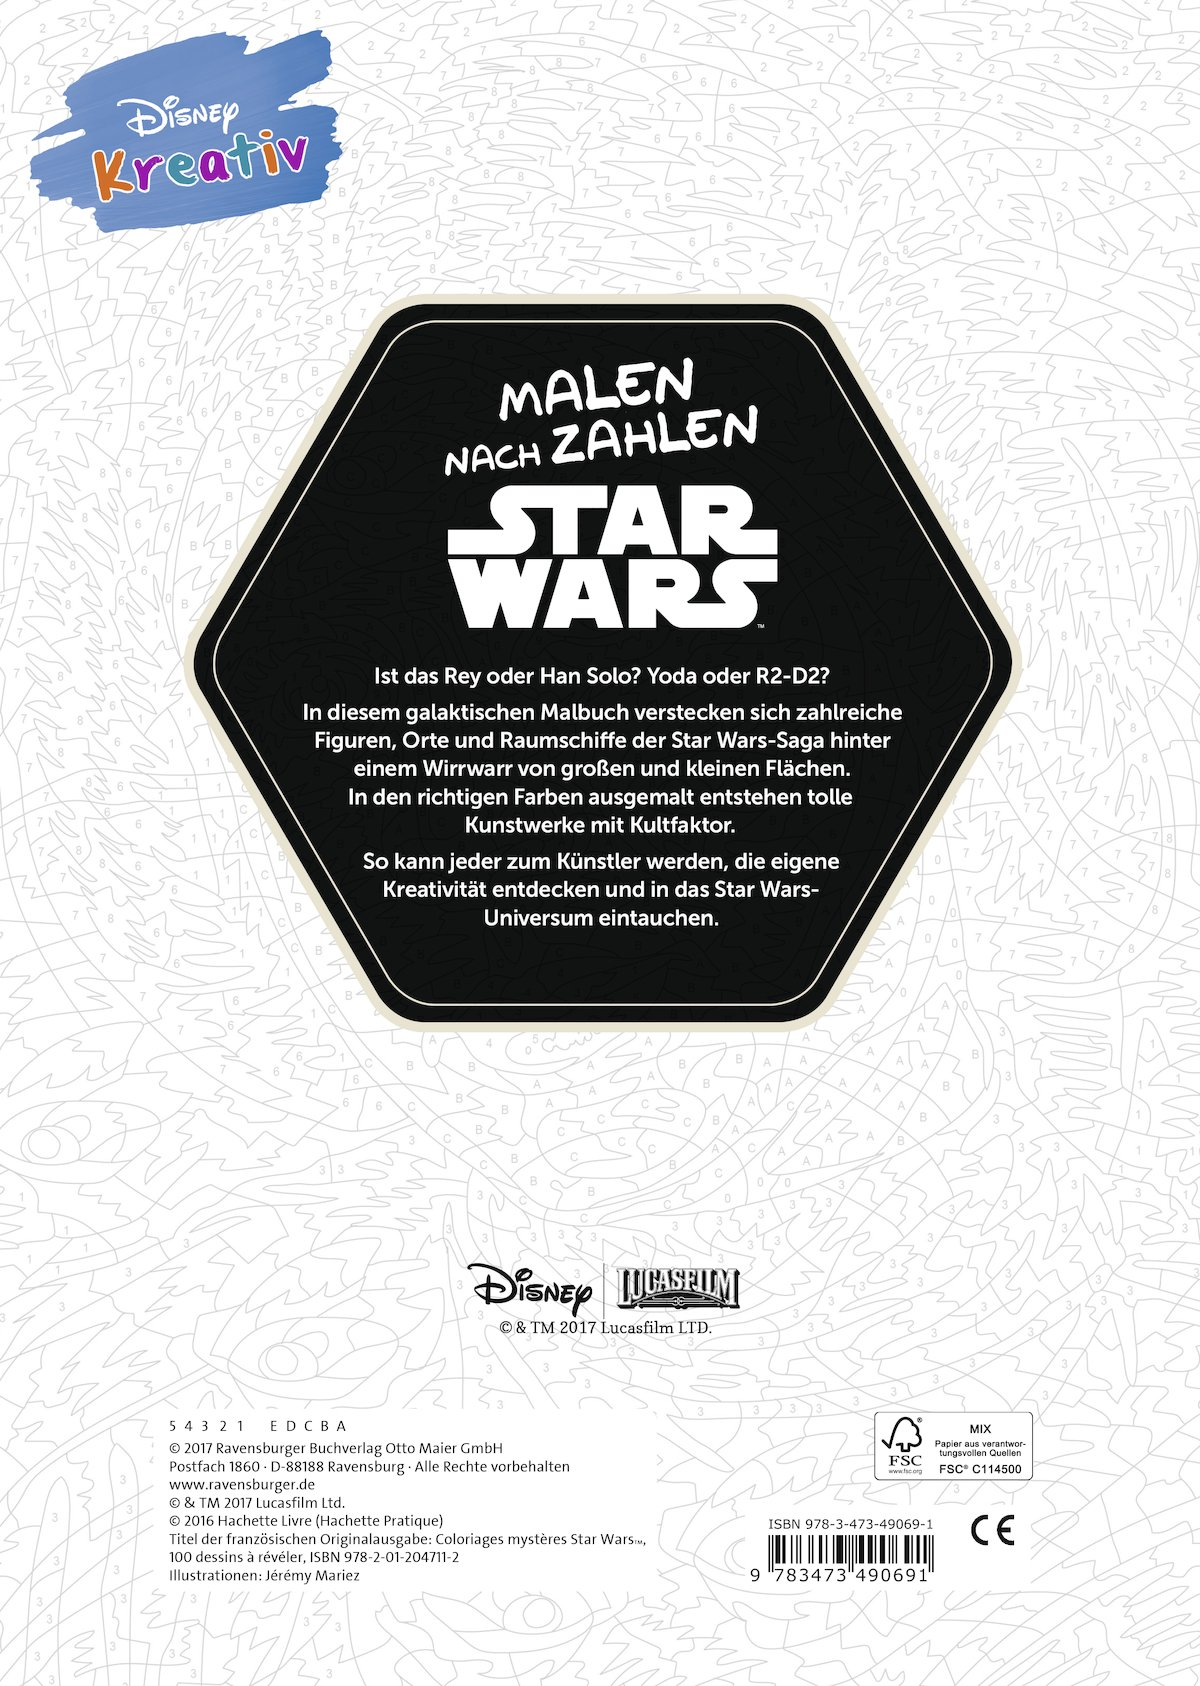 Disney kreativ: Star Wars(TM) Malen nach Zahlen: 9783473490691 ...